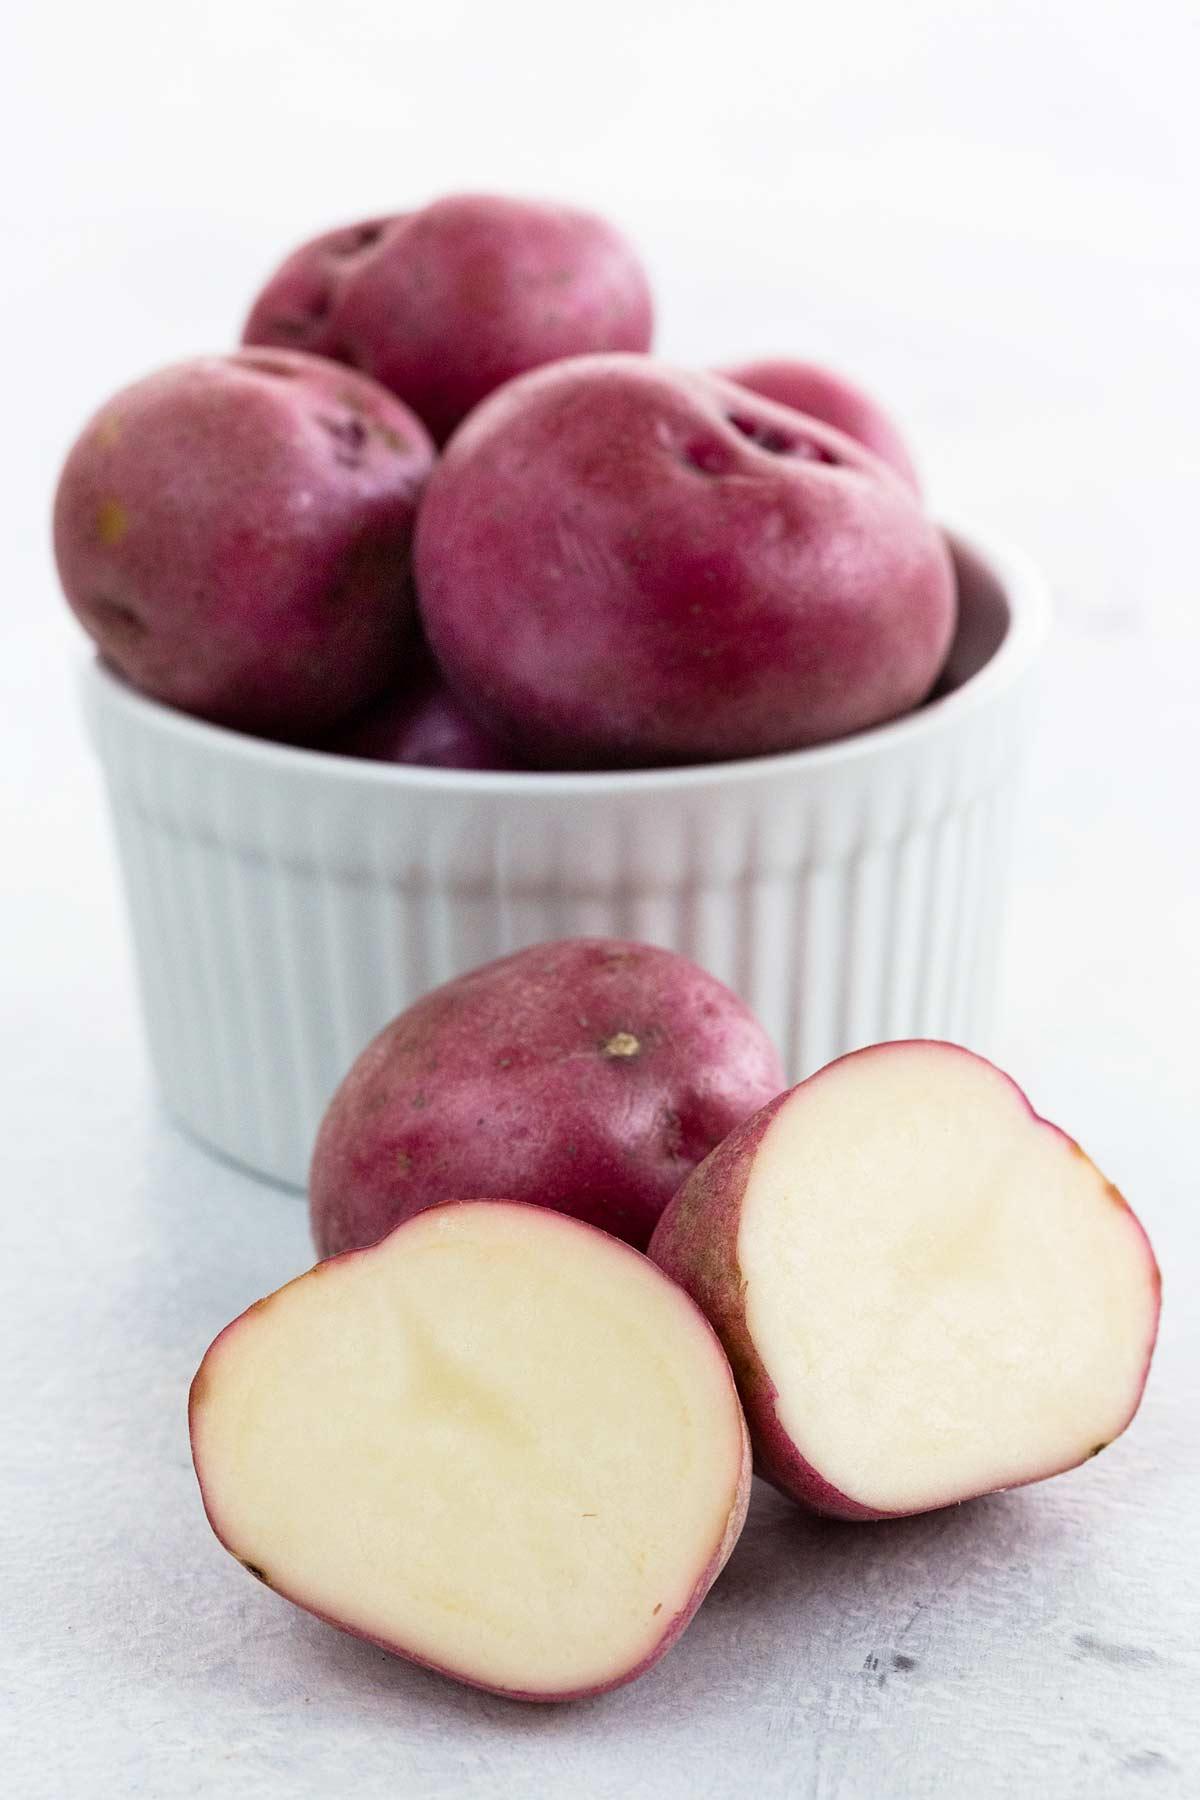 Red Potato (Waxy)